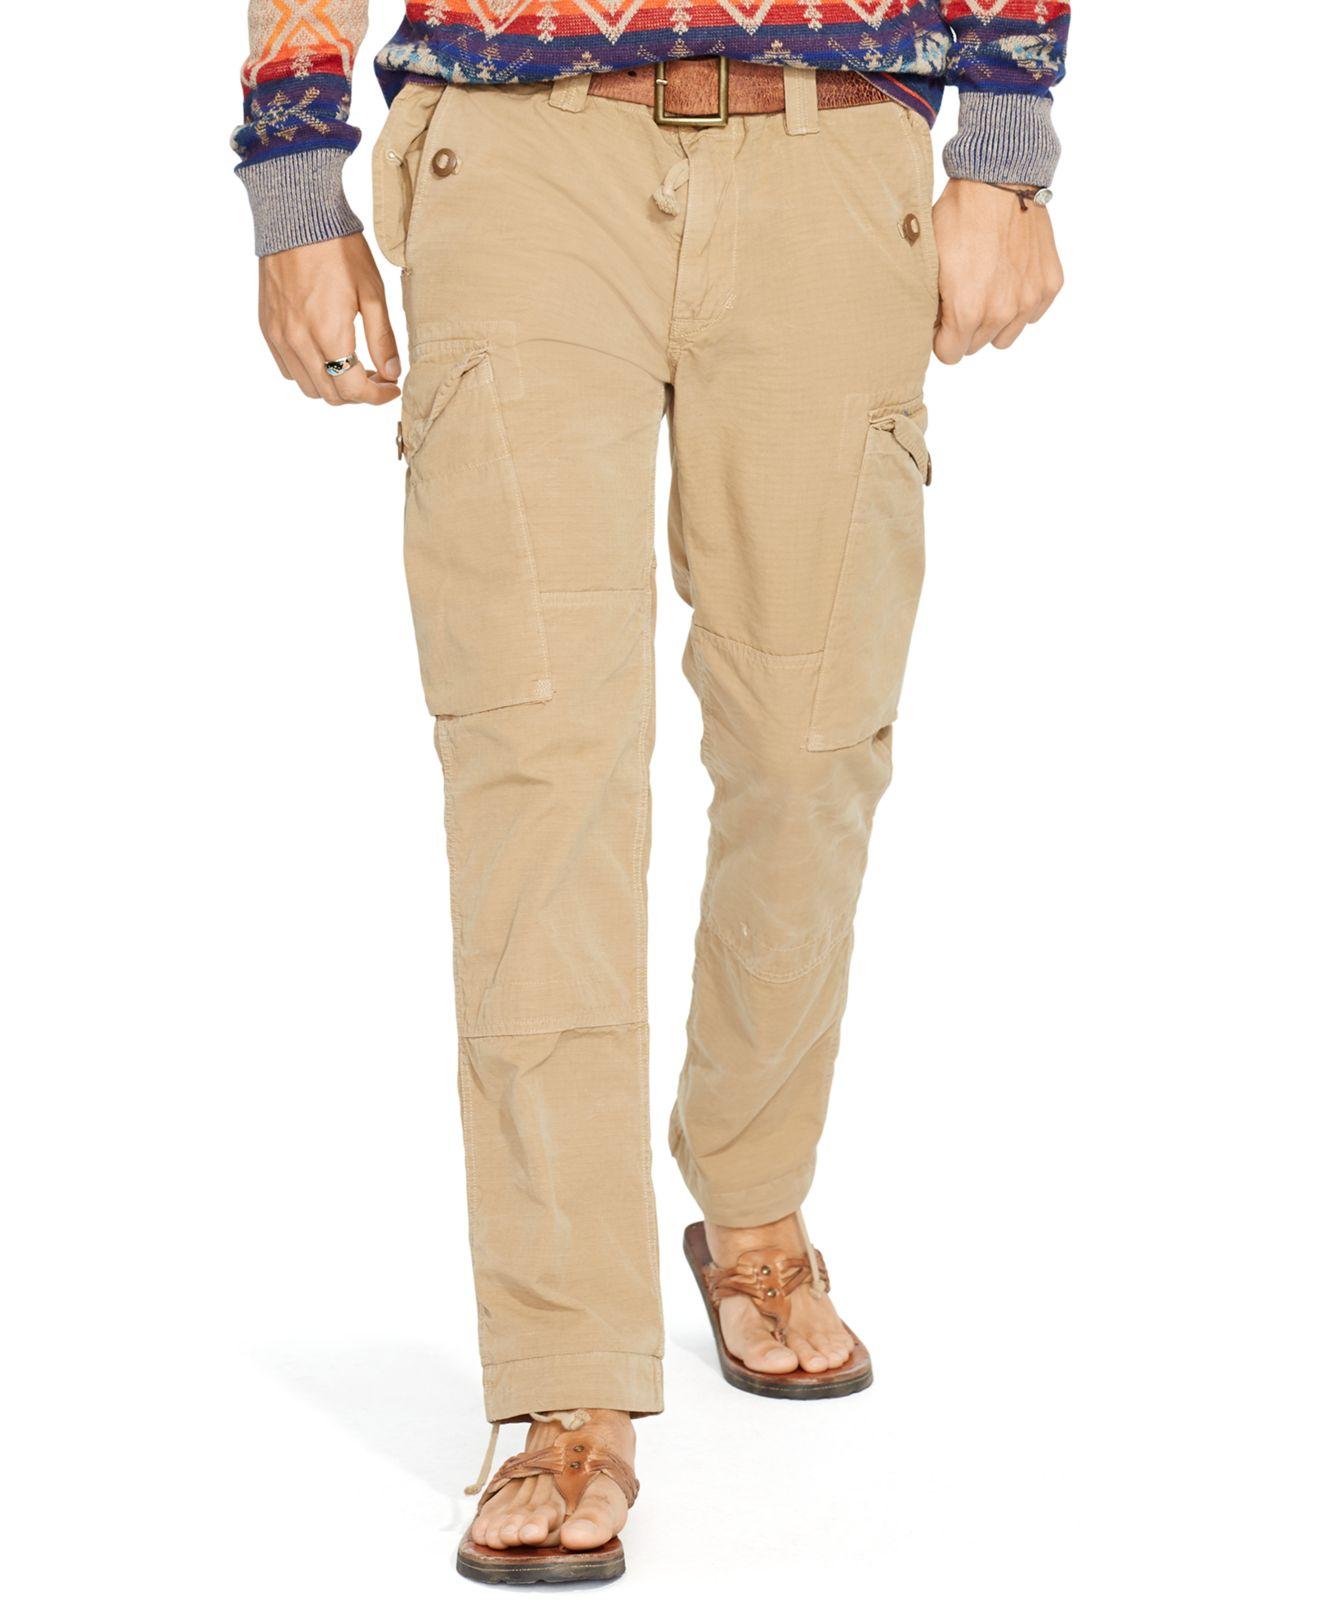 Chaps Ripstop Cargo Pants Ripstop Cargo Pant